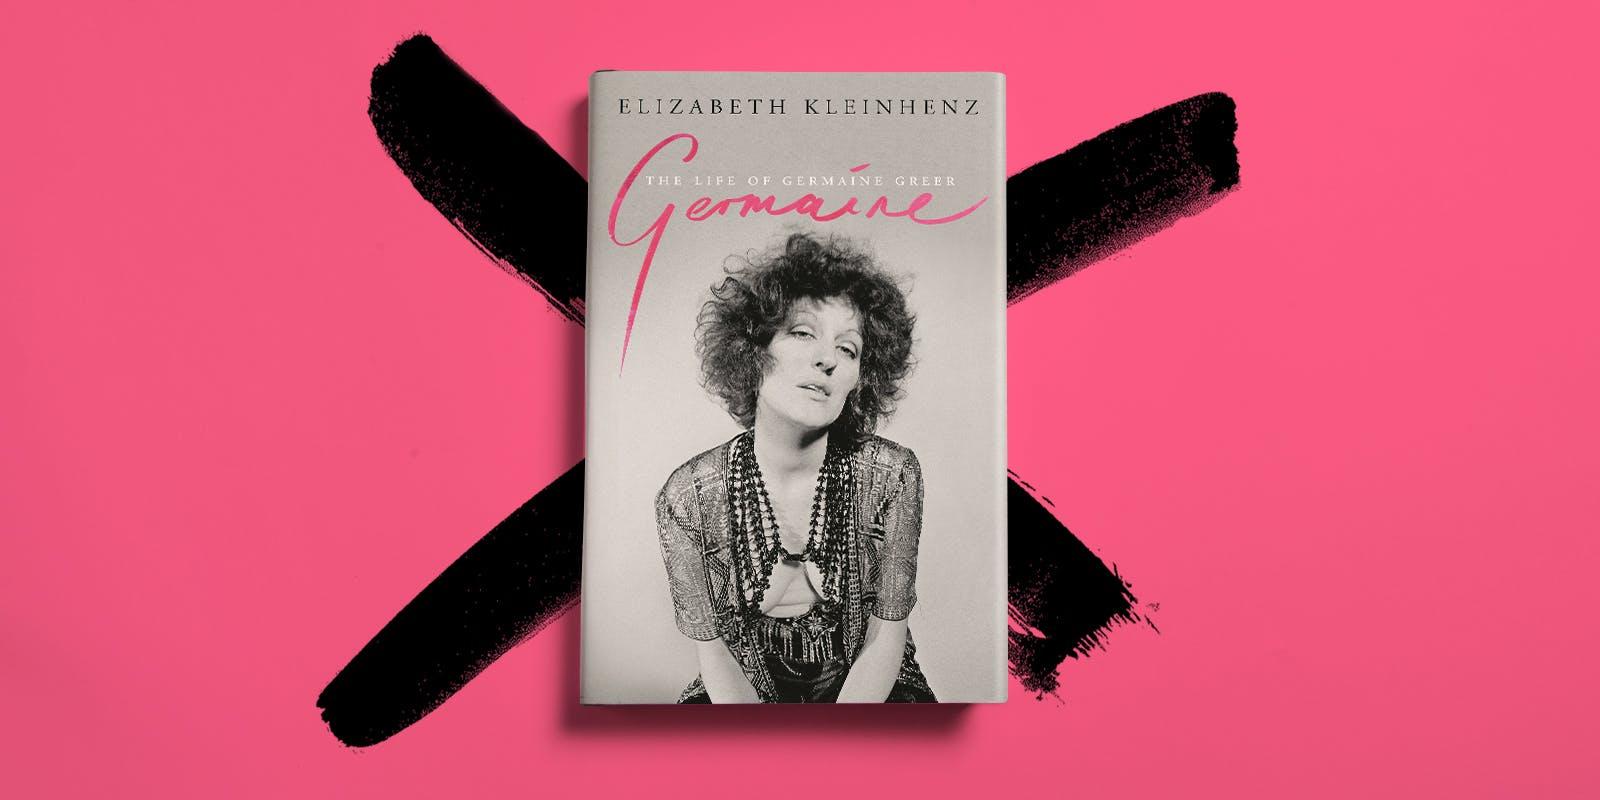 Researching Germaine